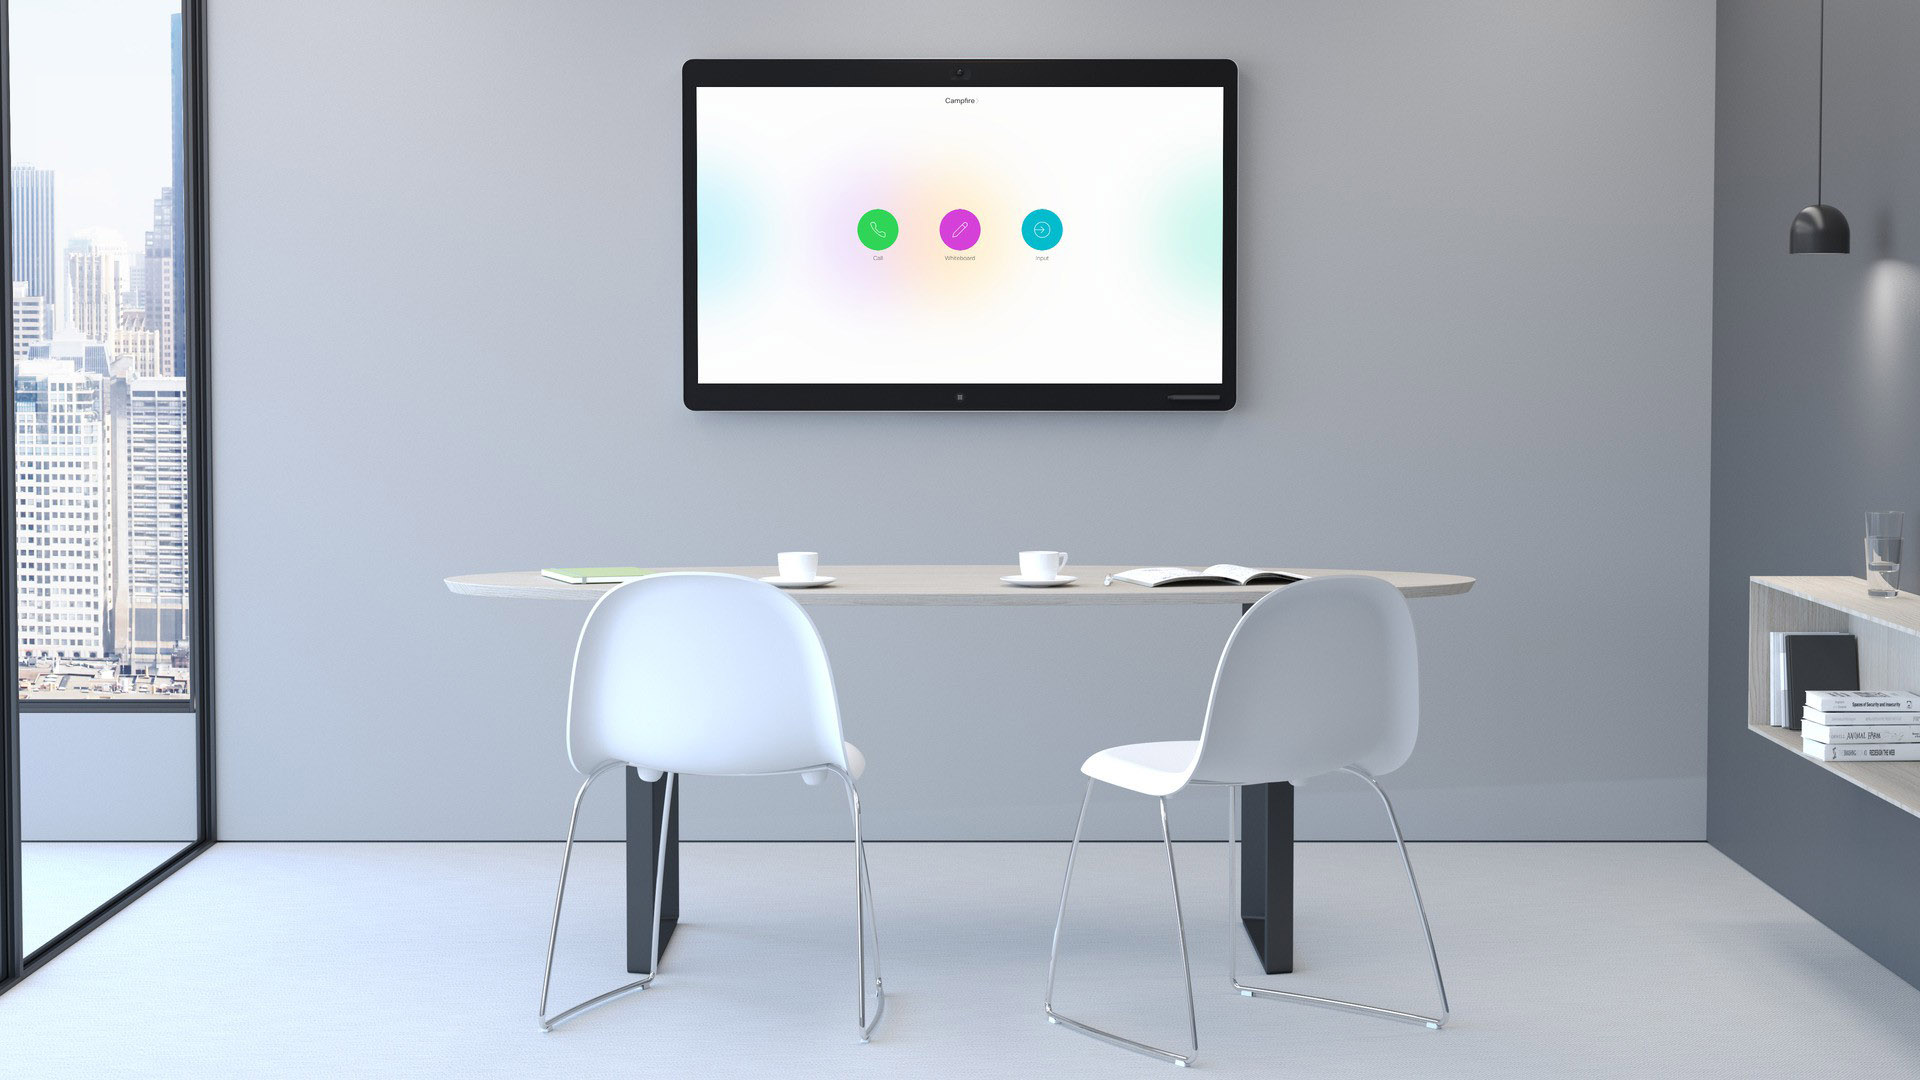 Webex board